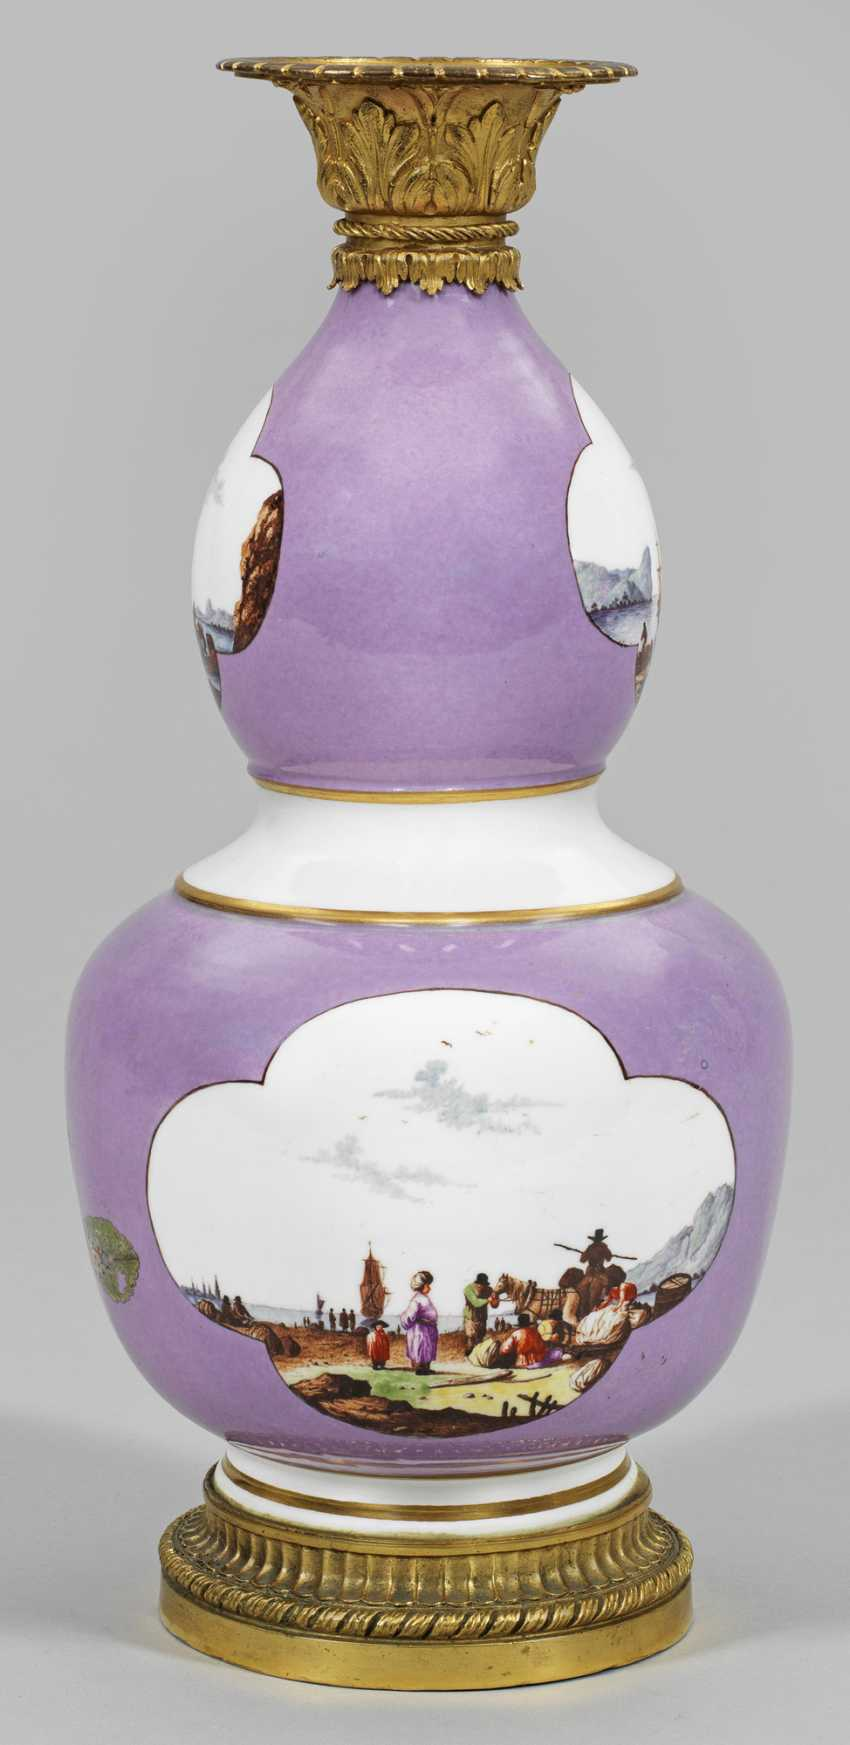 Large Calabash gourd vase with kauffahrtei scenes - photo 1